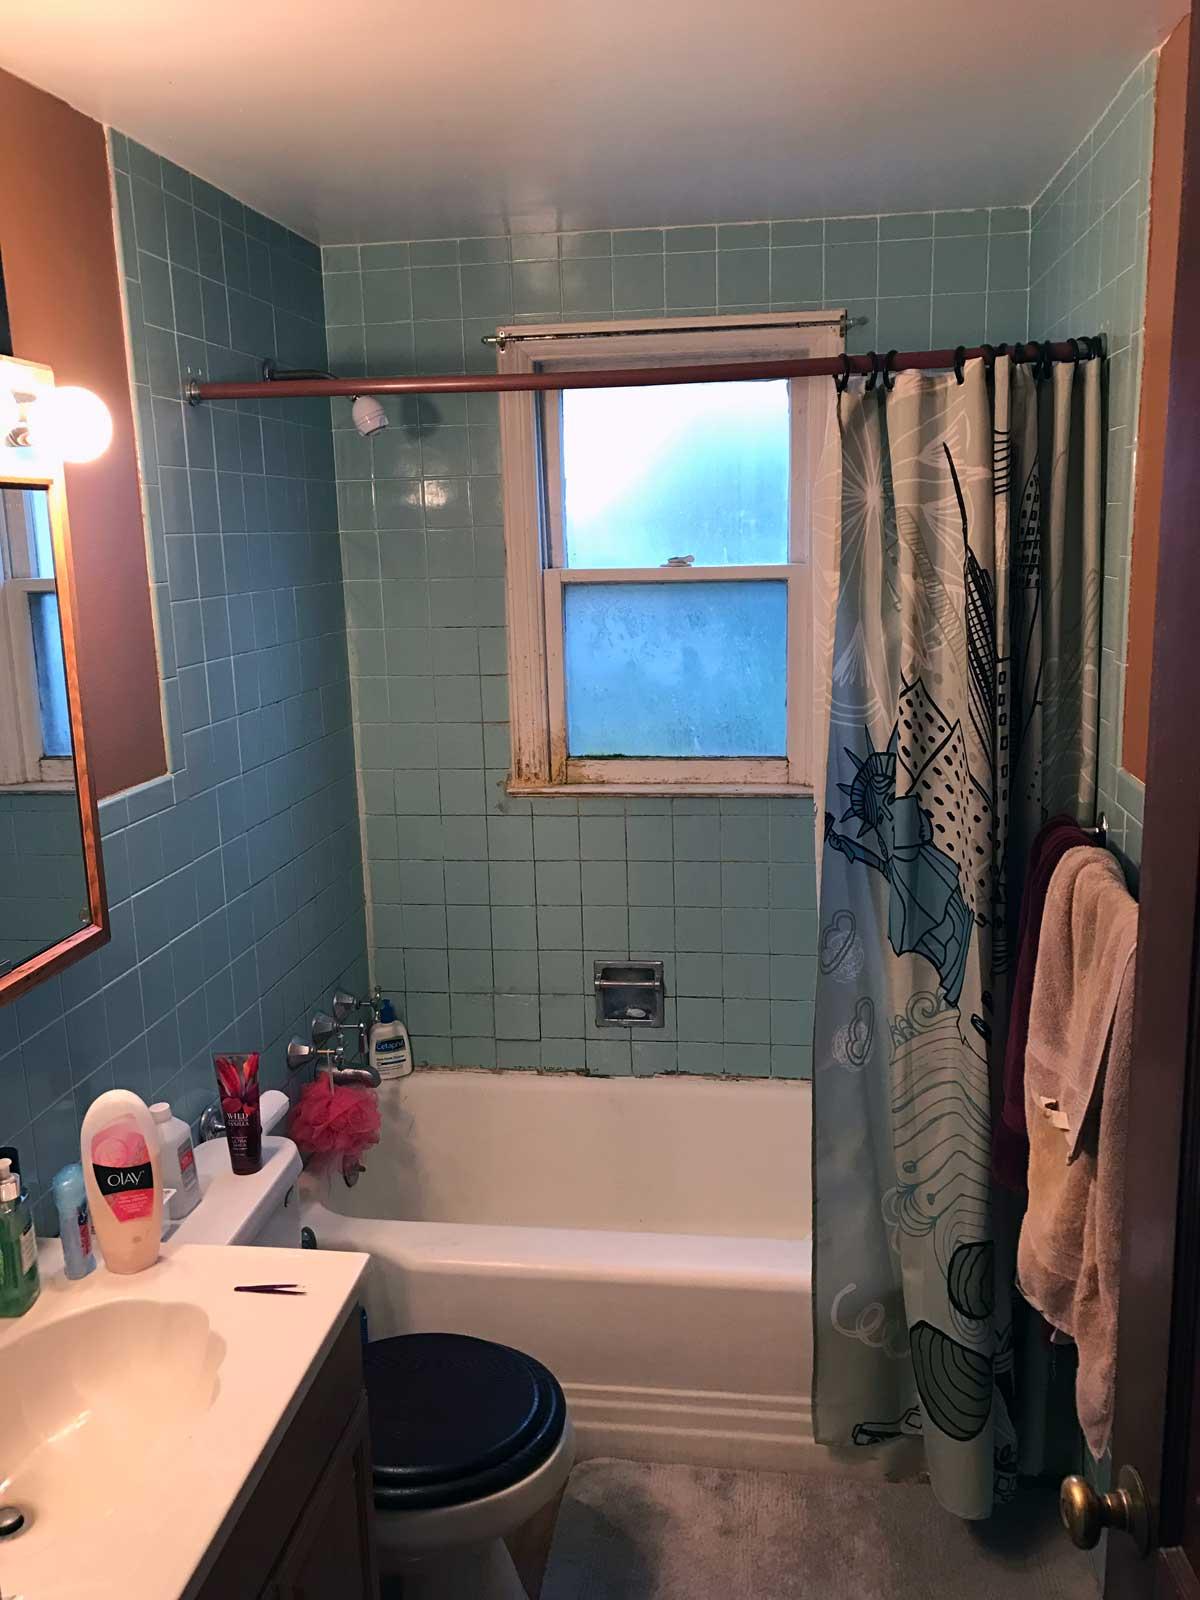 15 Day Bathroom Renovation Before